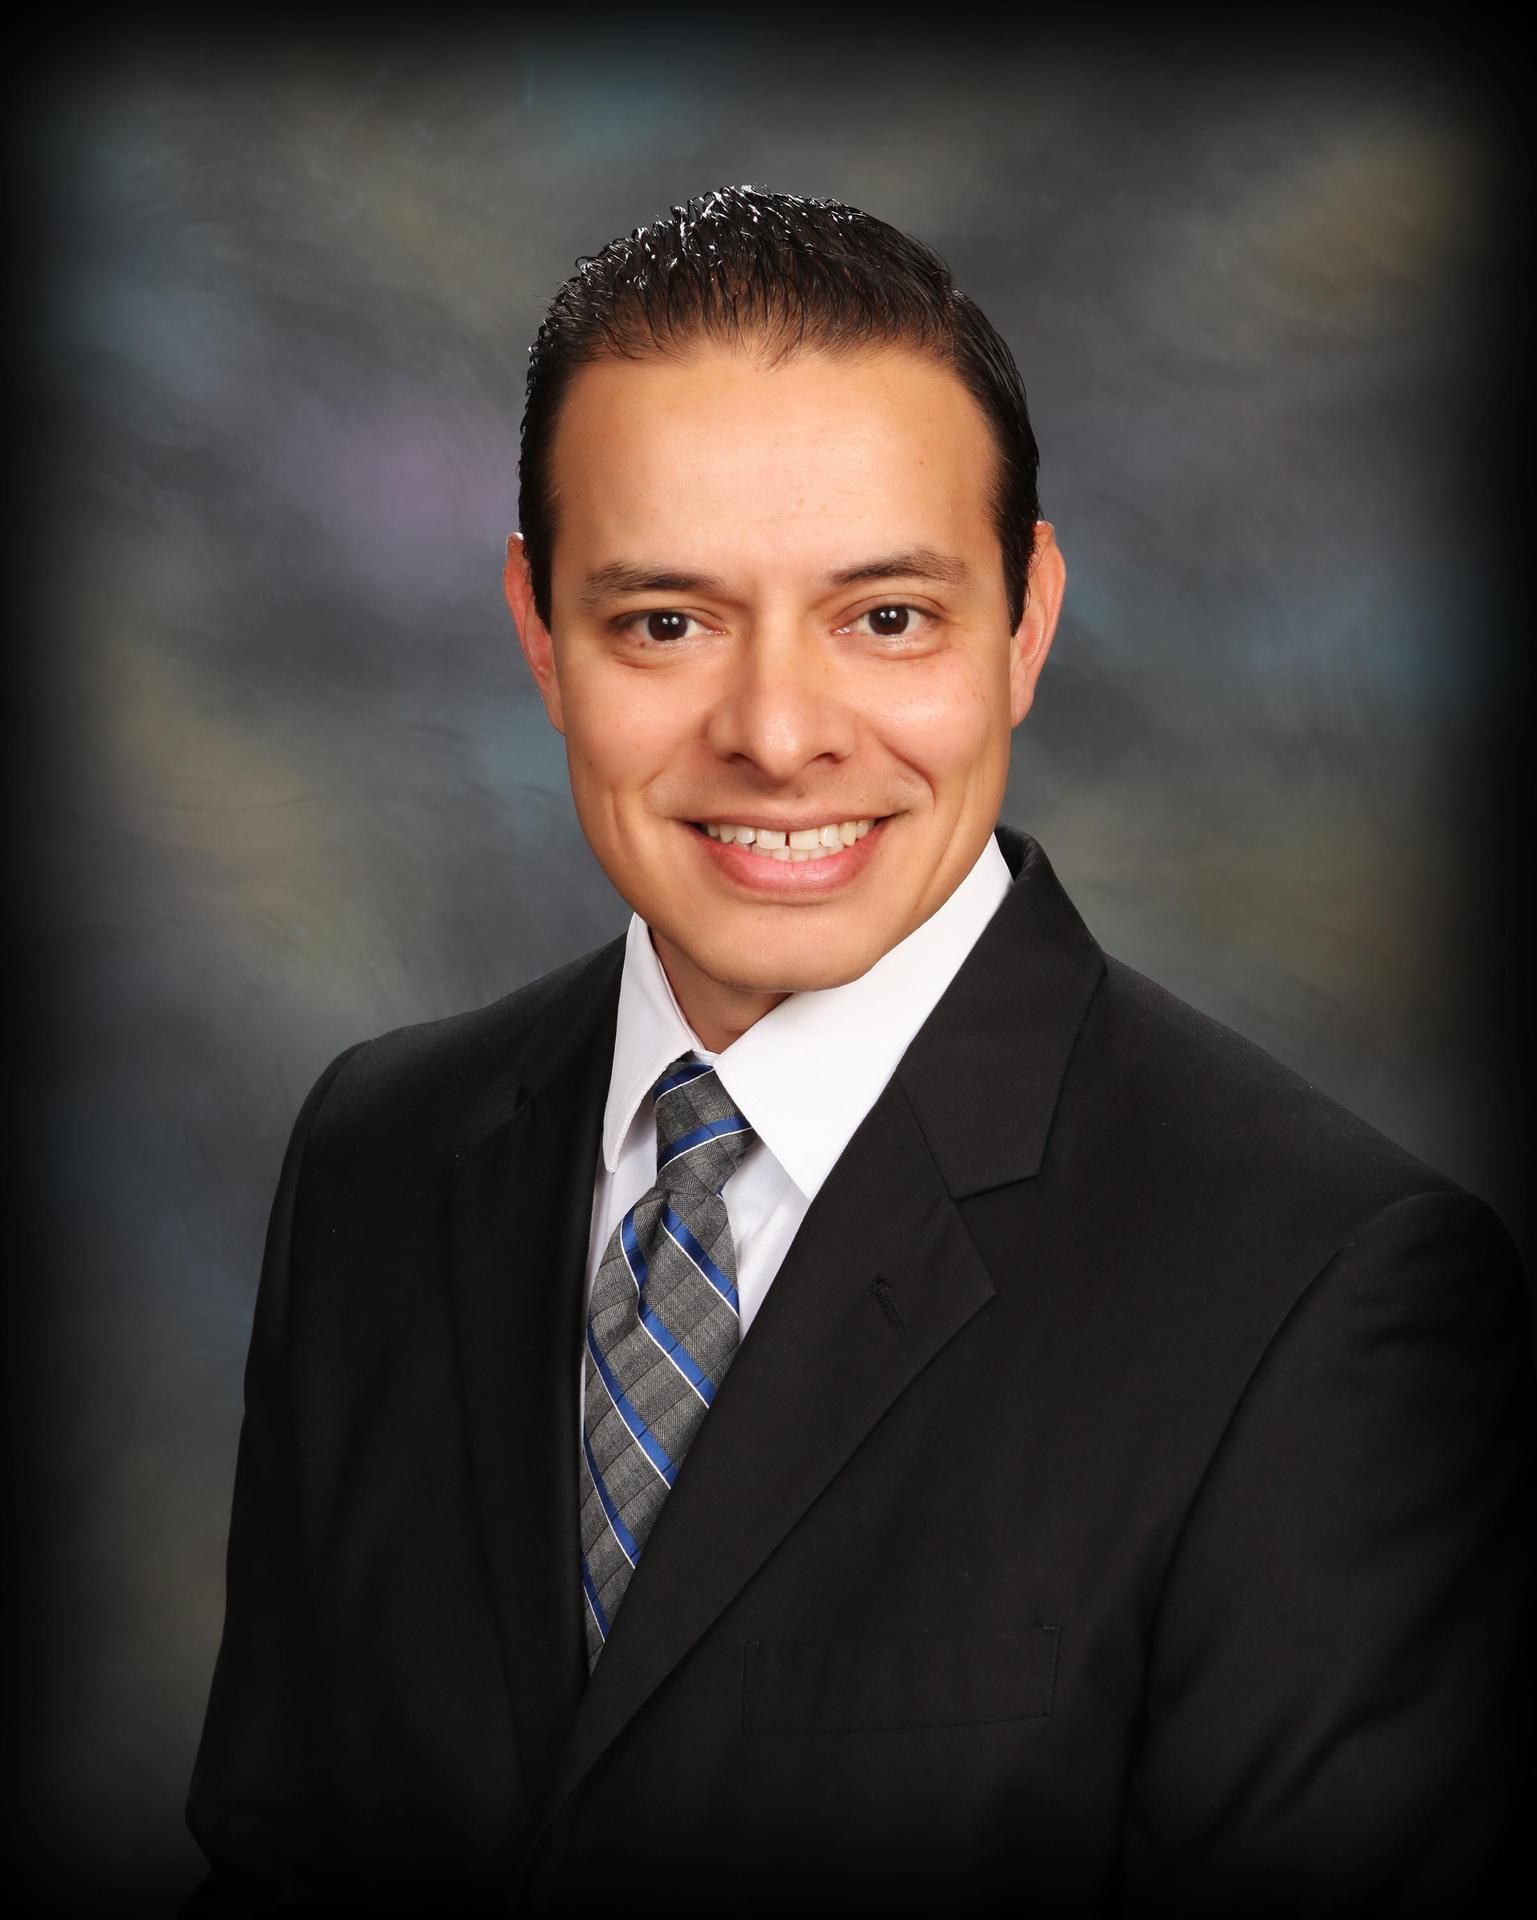 Pedro Ramirez